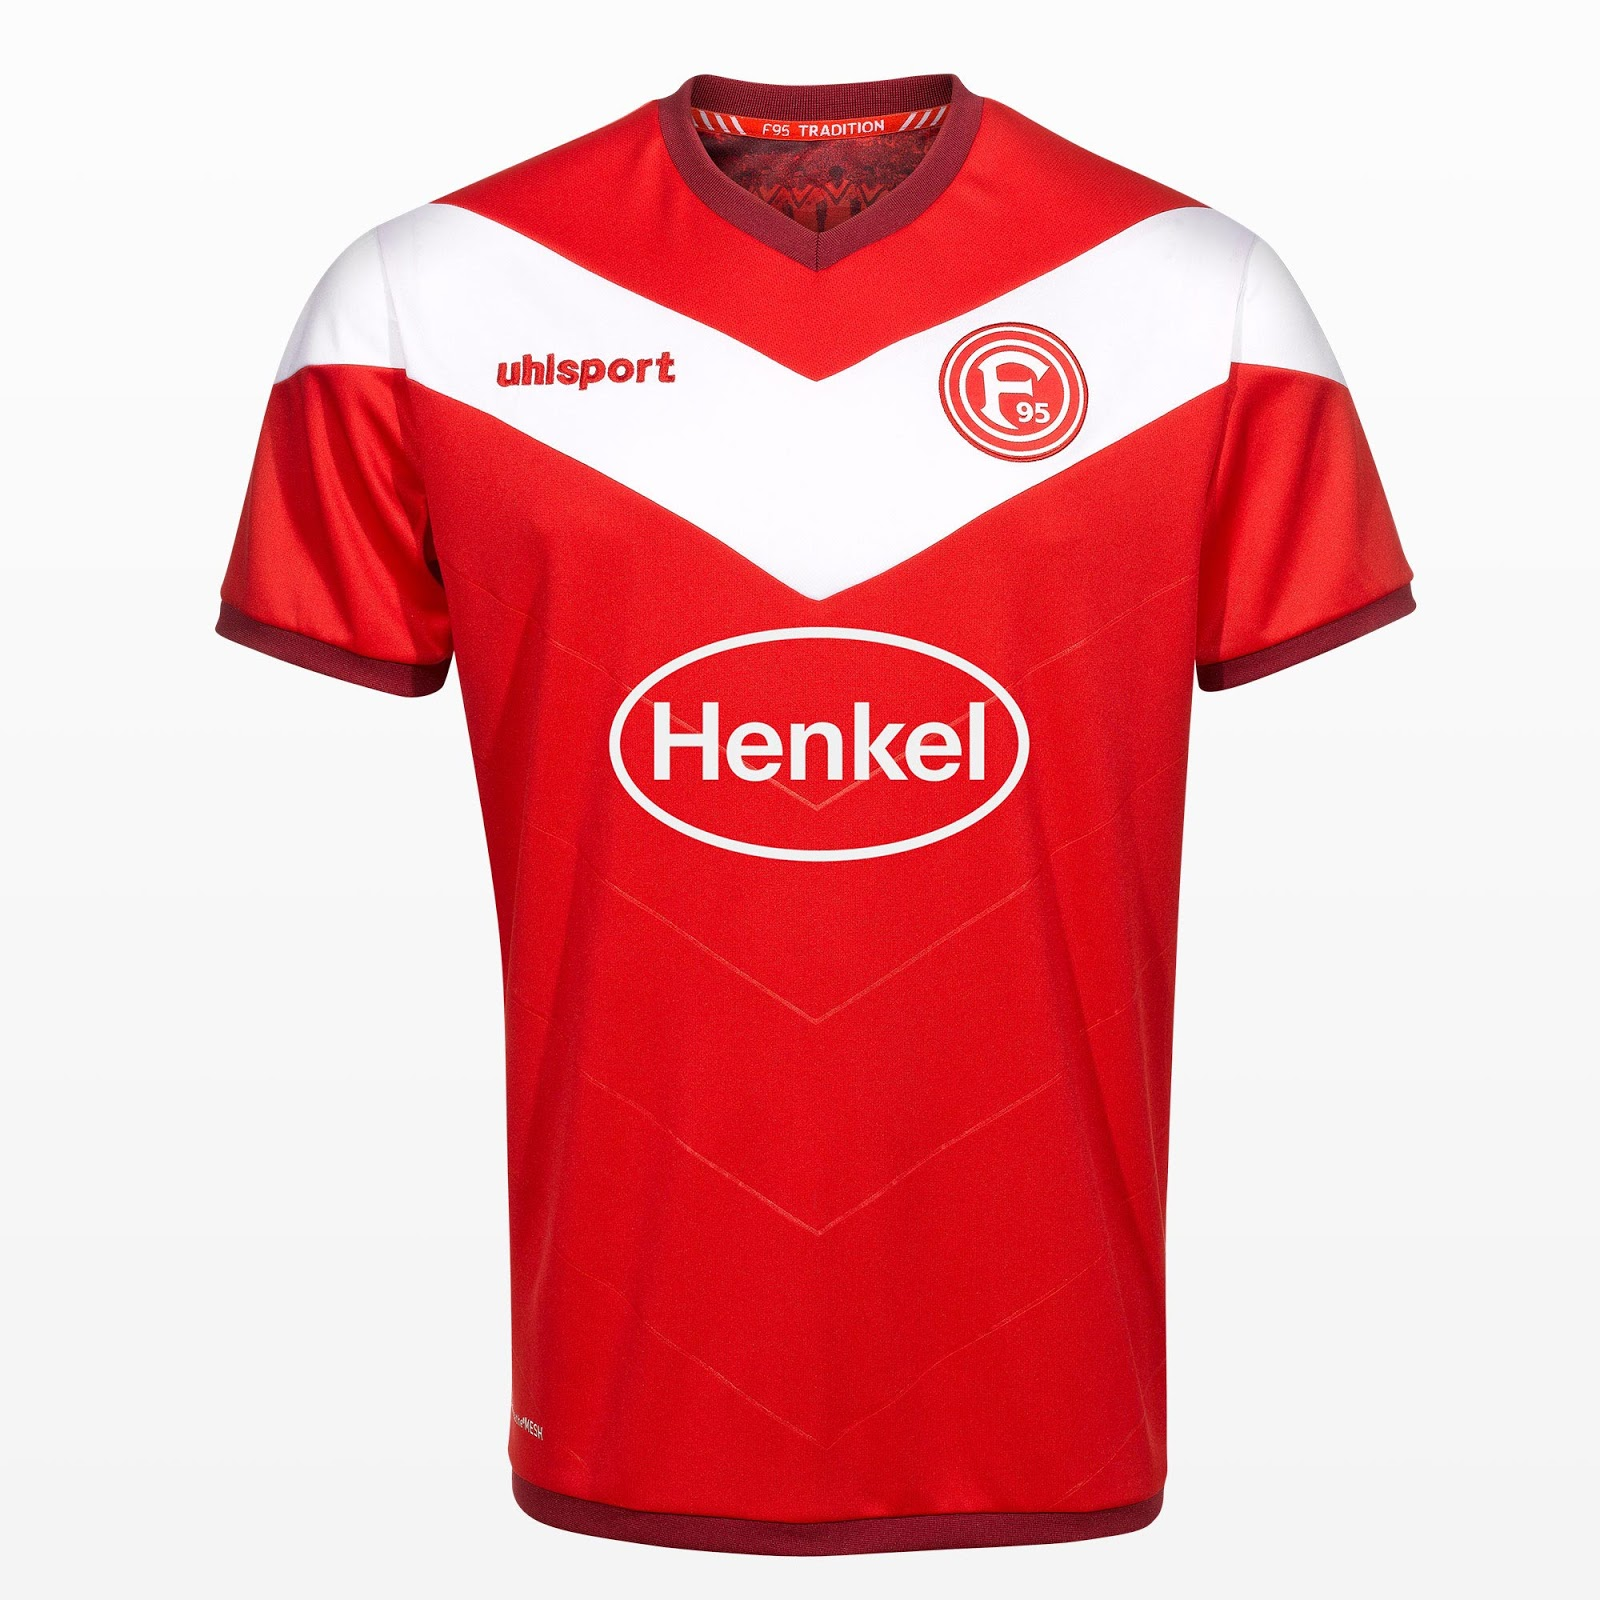 Neue Bundesliga Trikots 18/19